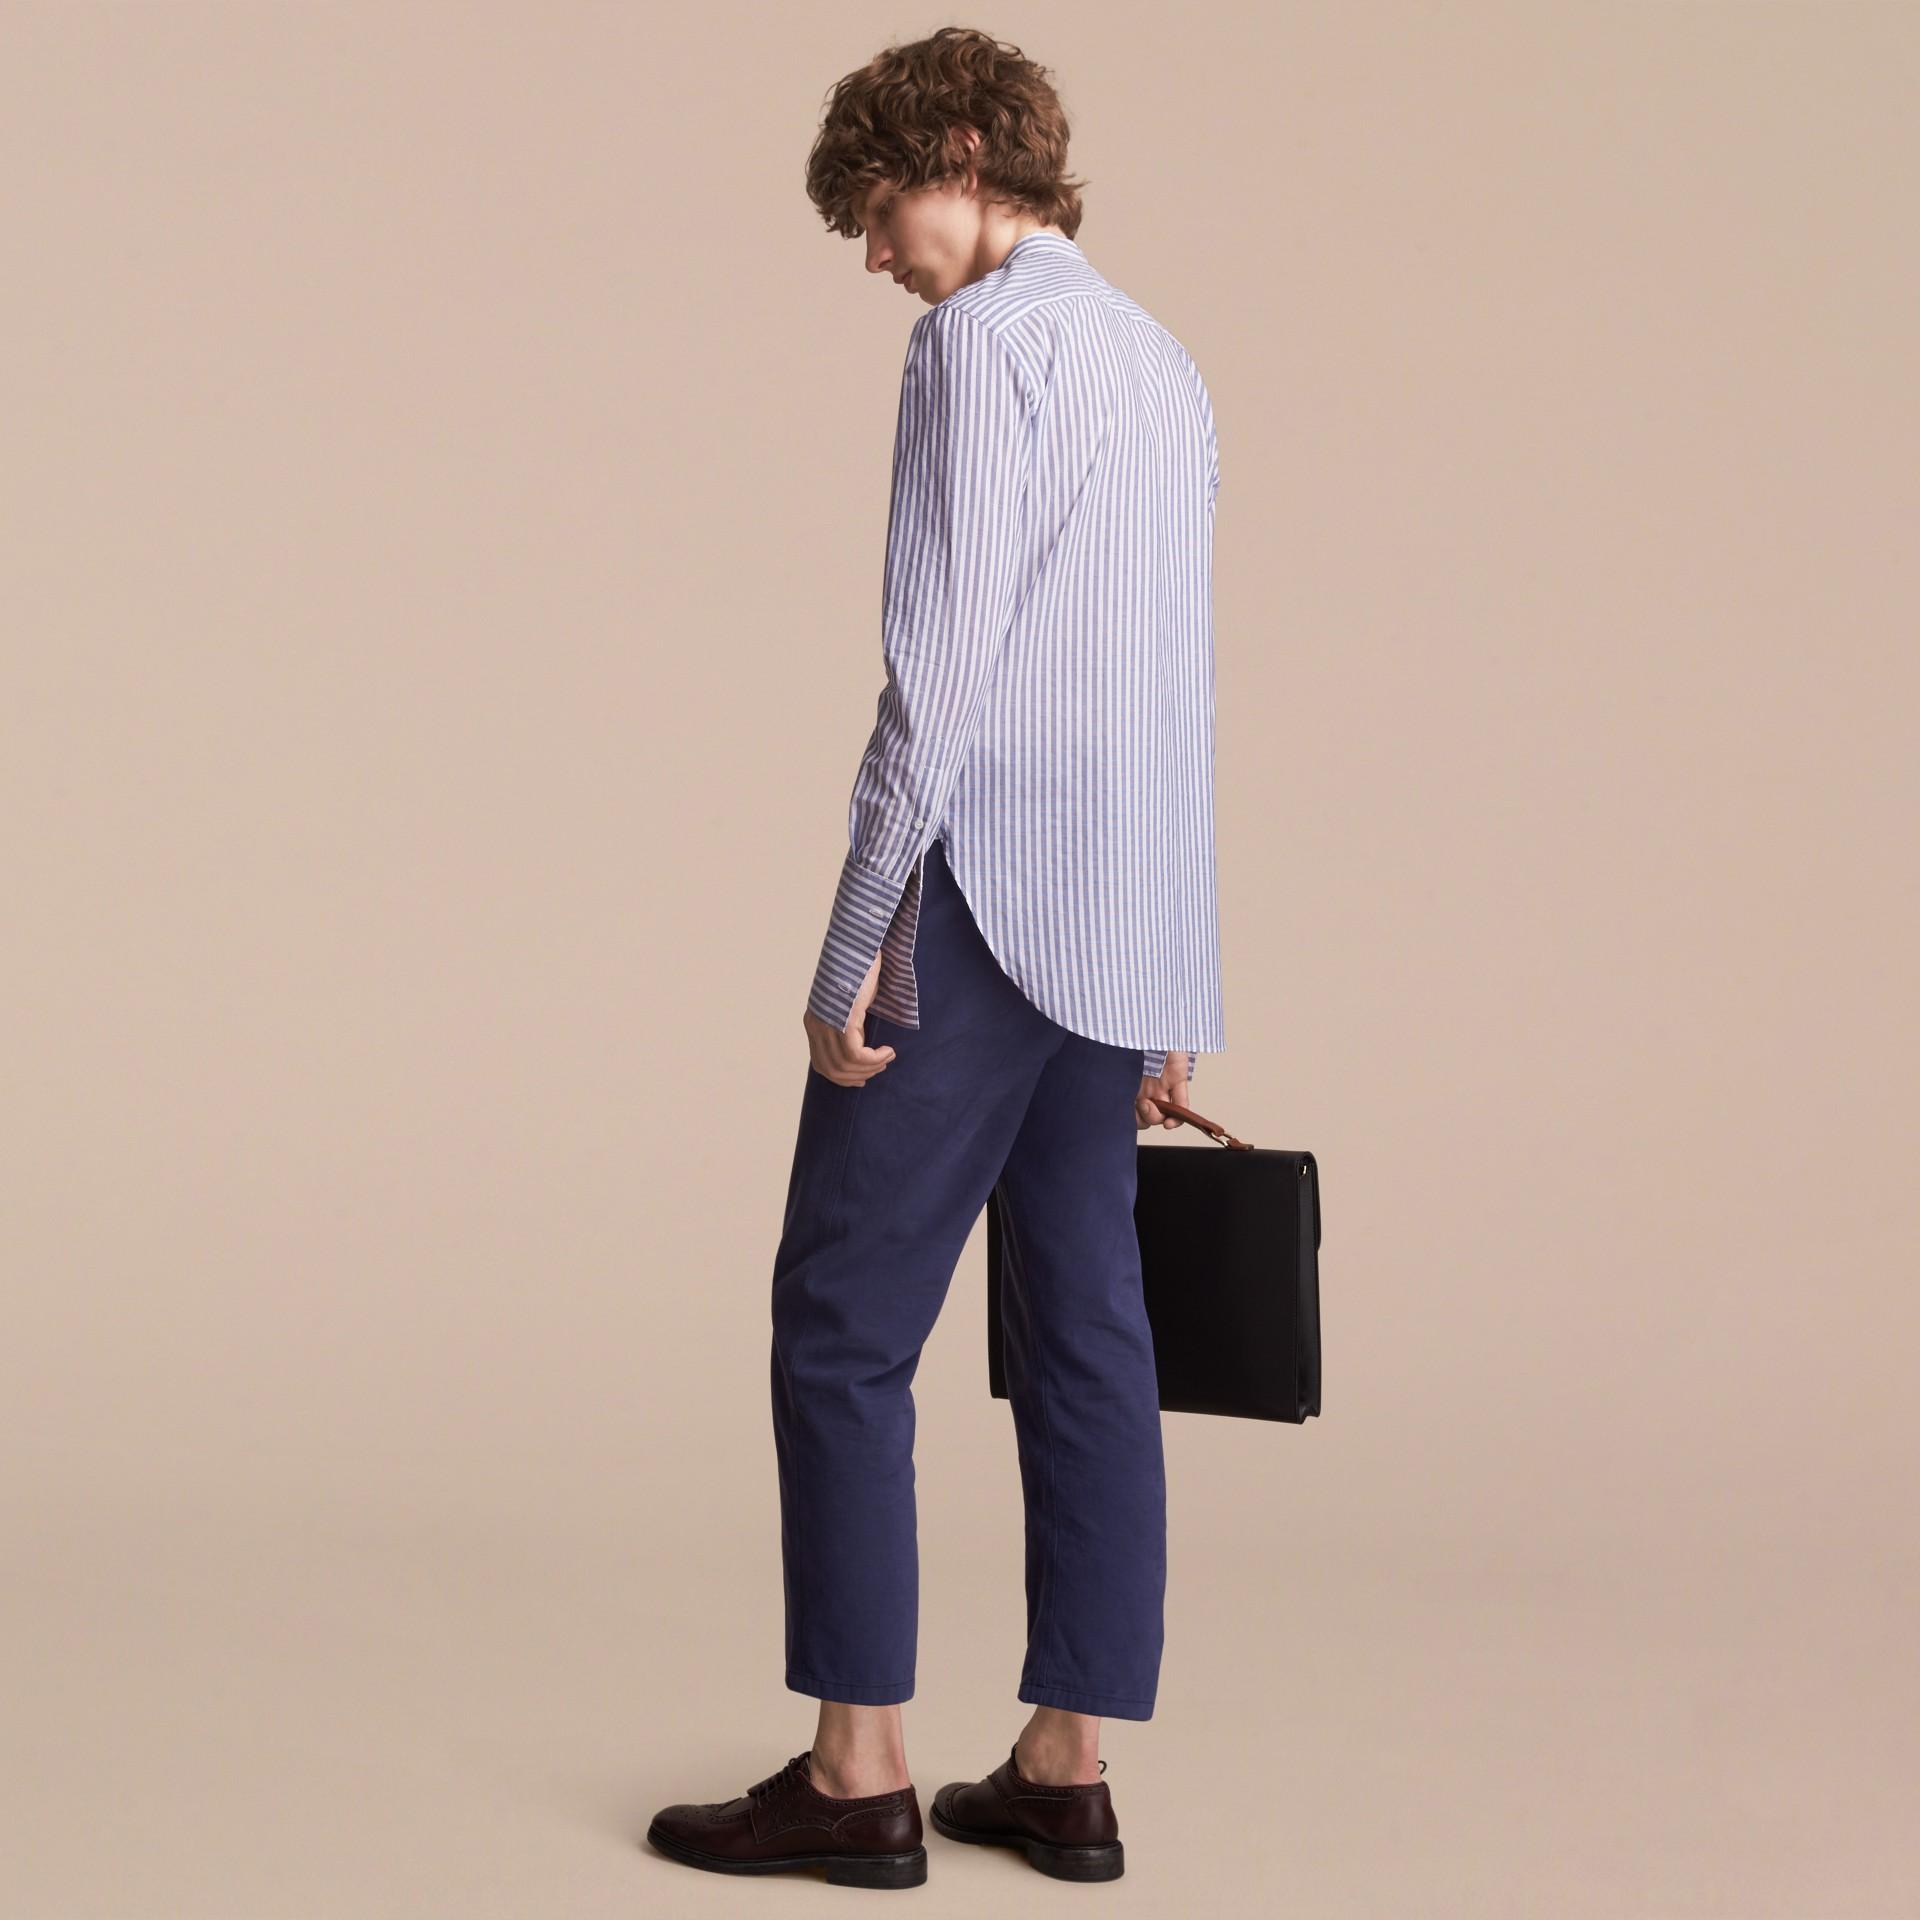 Unisex Pleated Bib Striped Cotton Shirt - gallery image 3